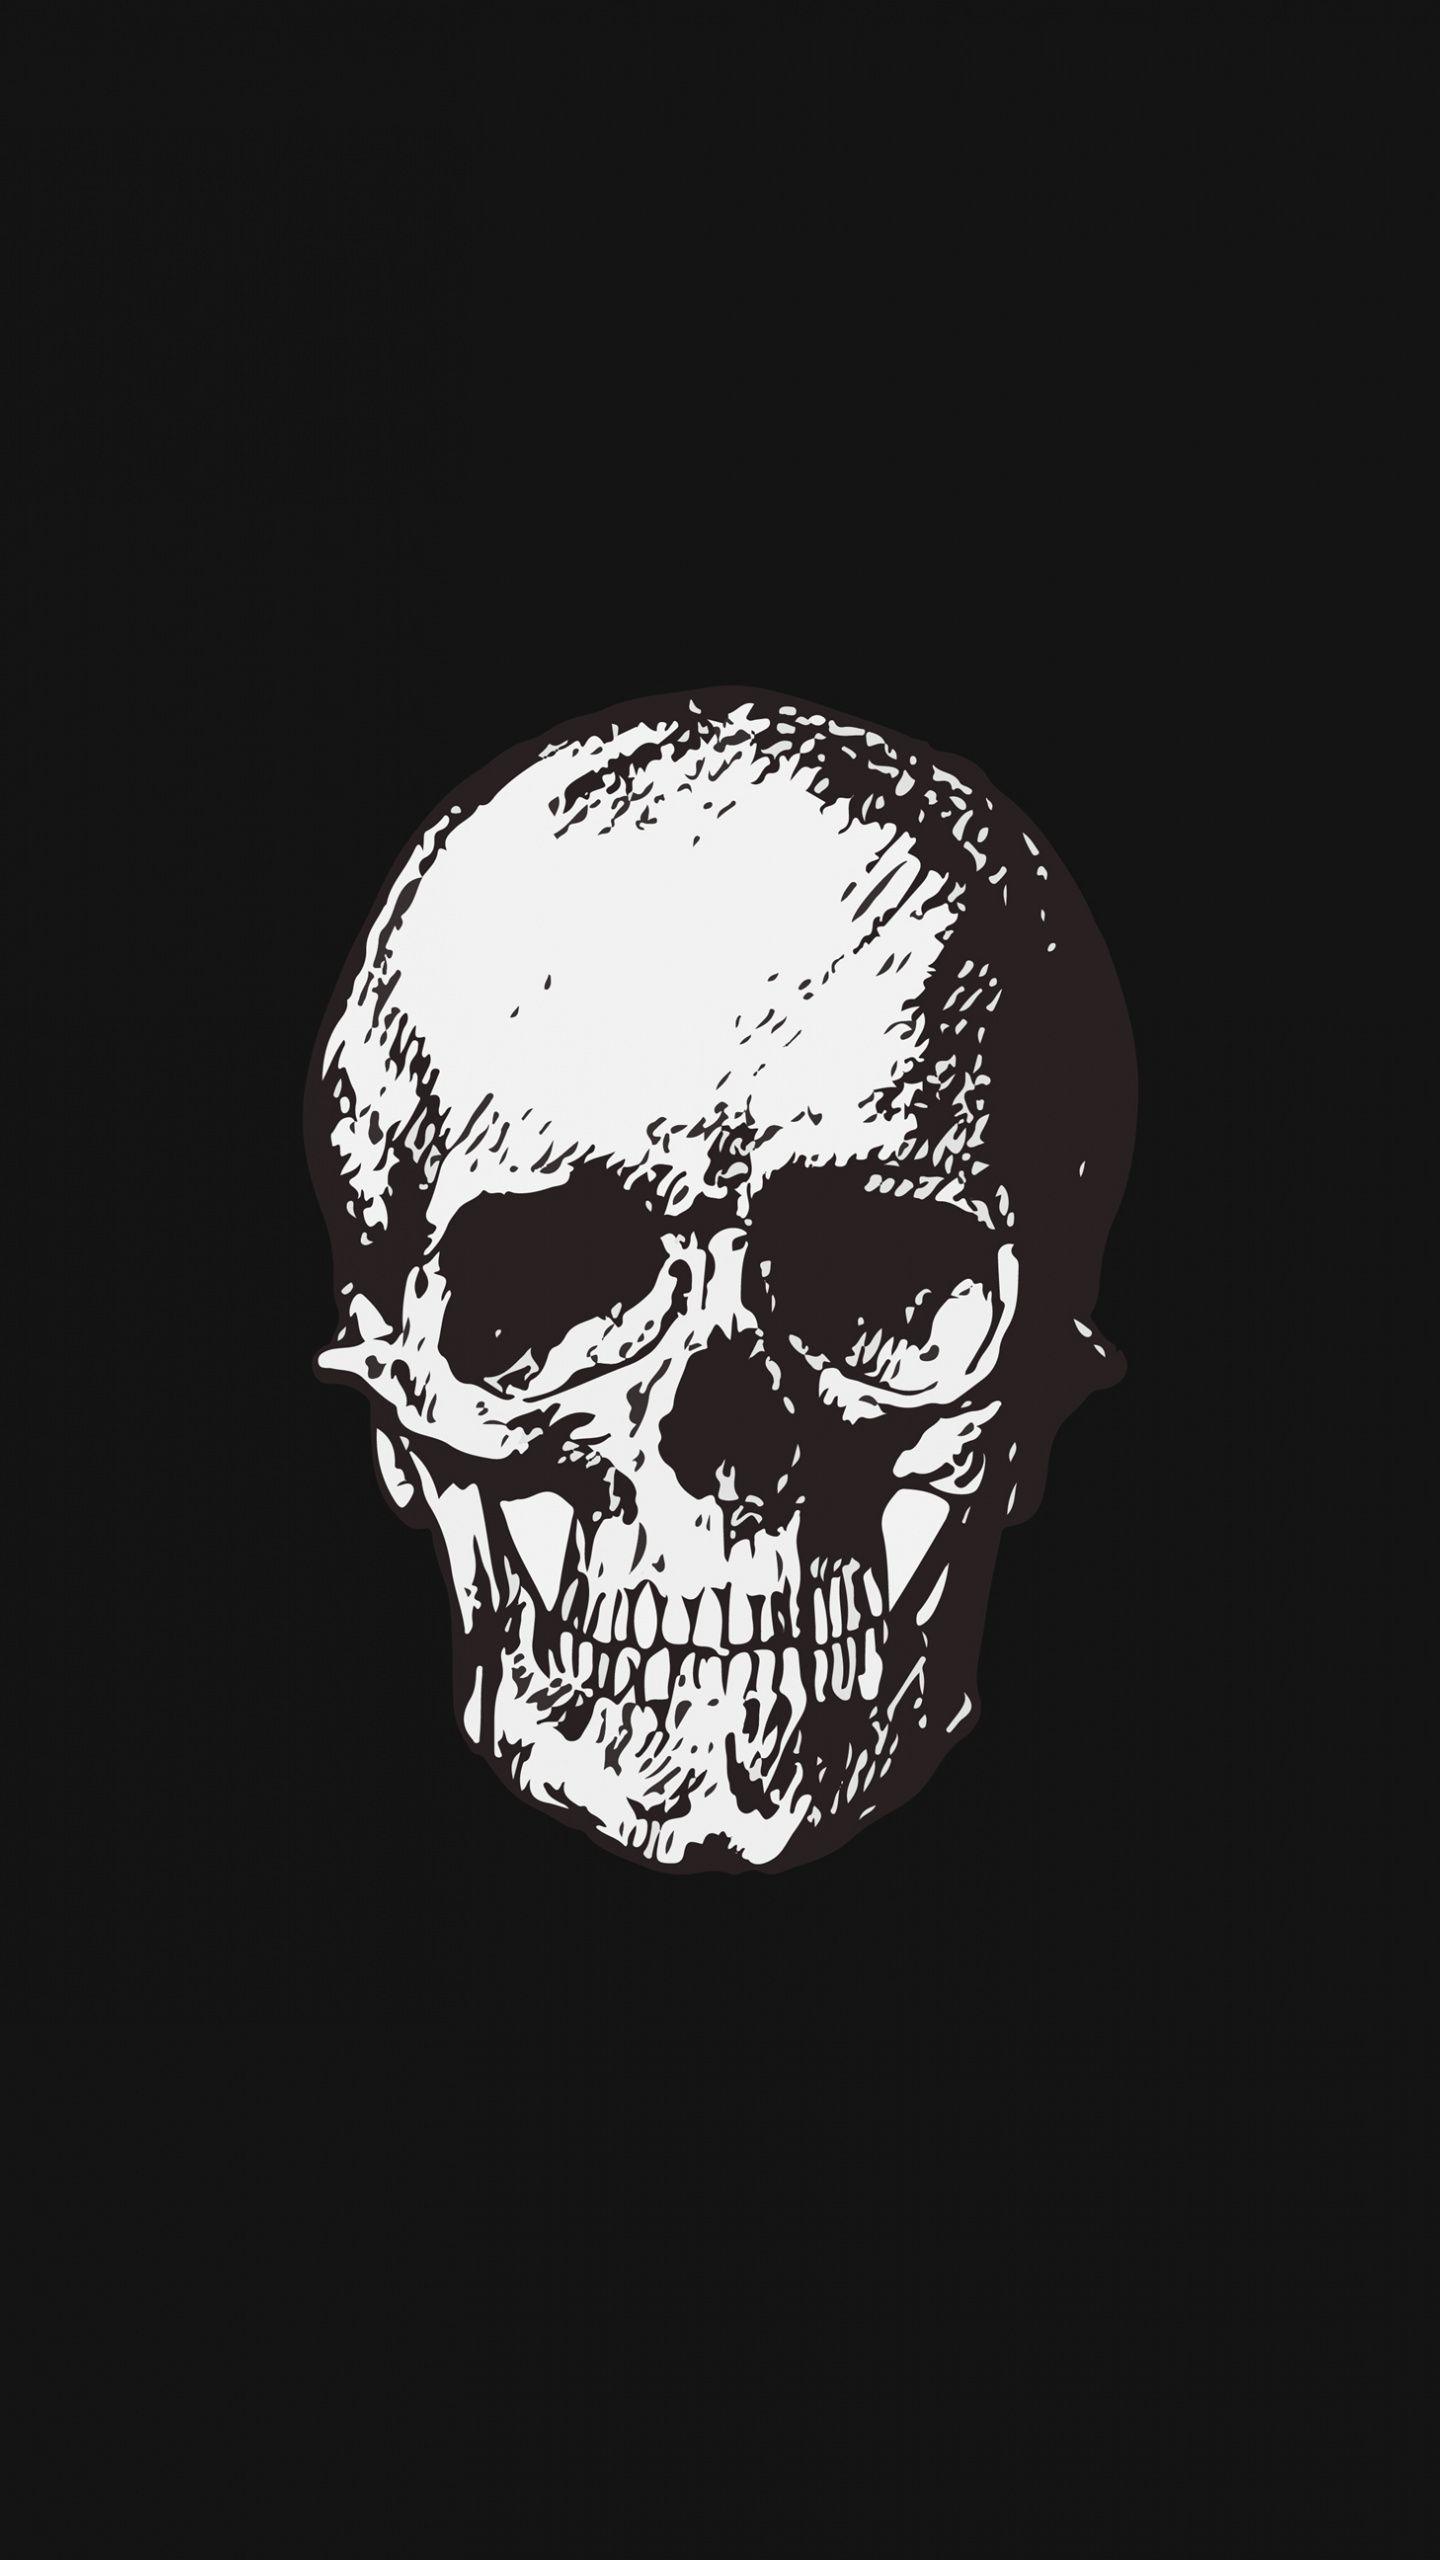 1440x2560 Skull Bw Minimal Art Wallpaper Art Wallpaper Art Black Wallpaper Iphone